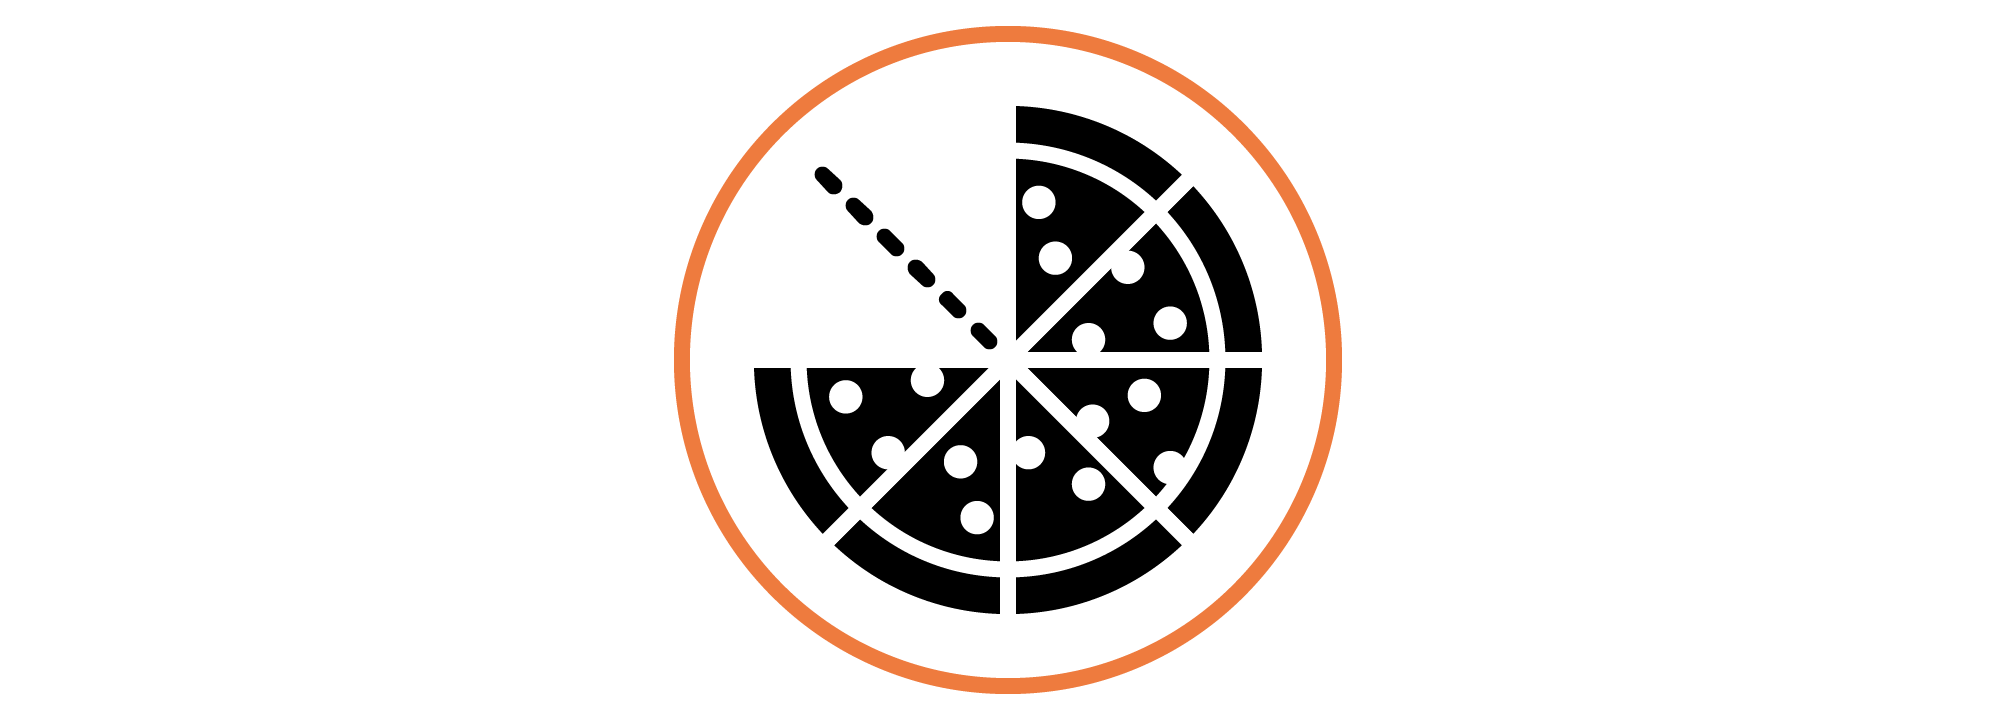 icon-rewards_3-wide.png